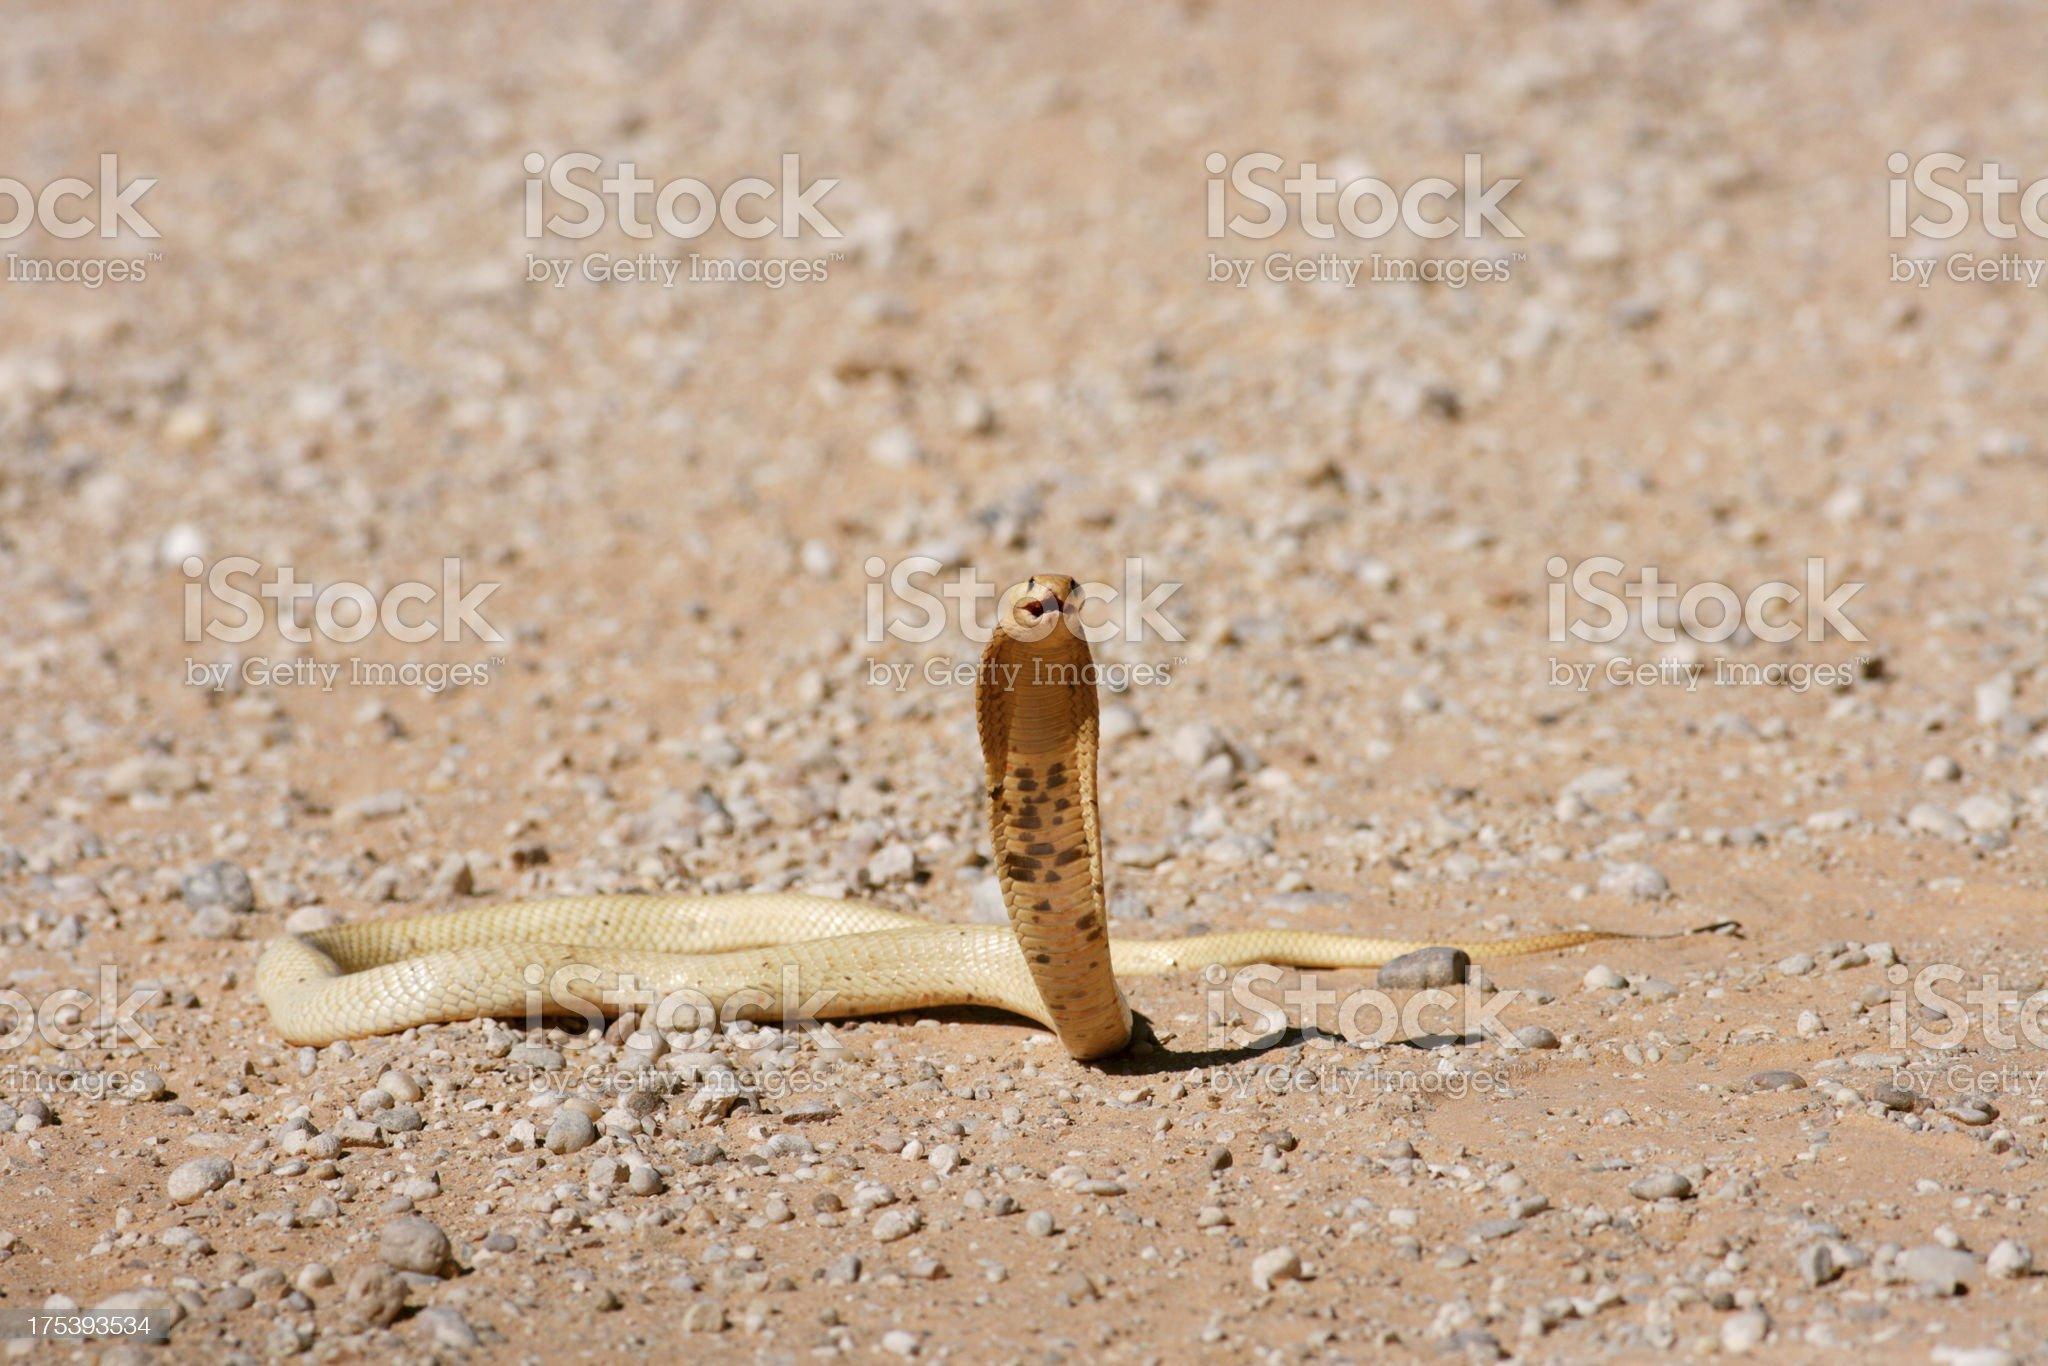 Cape cobra, naja nivea, in threat pose, with hood open royalty-free stock photo